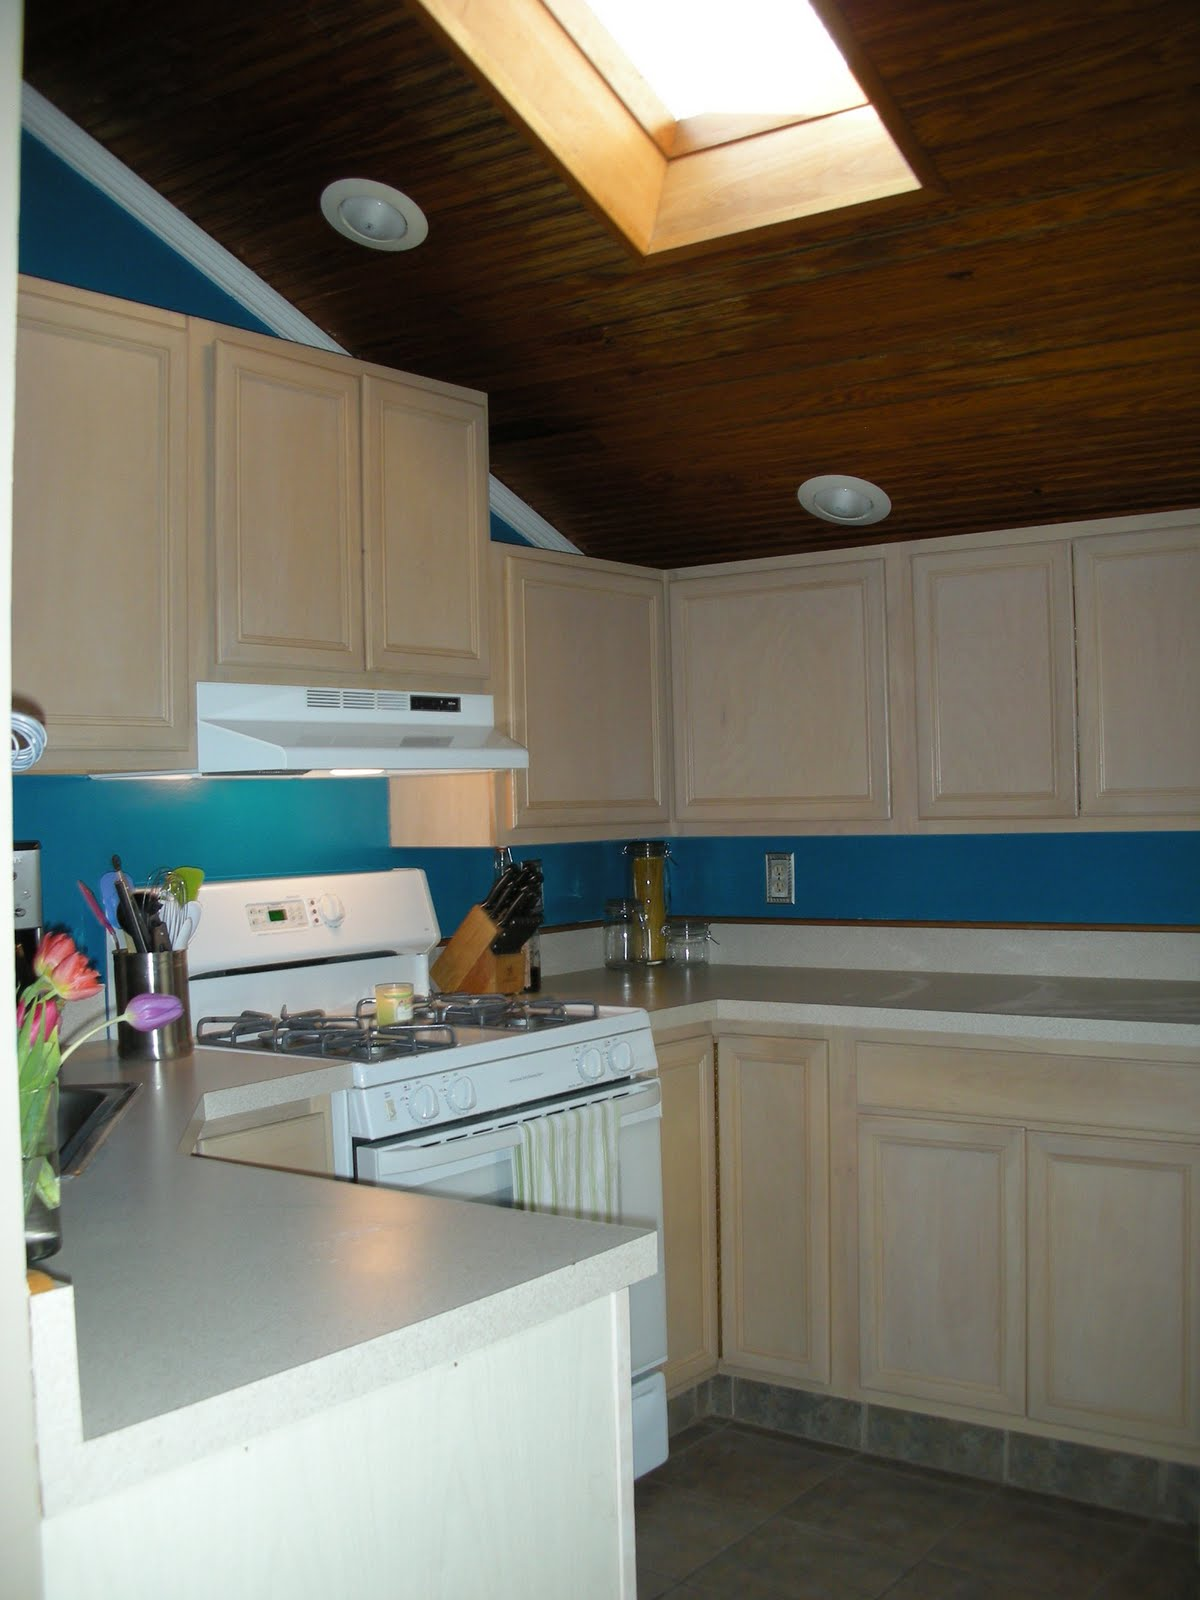 Buy Discount Kitchen Cabinets Online